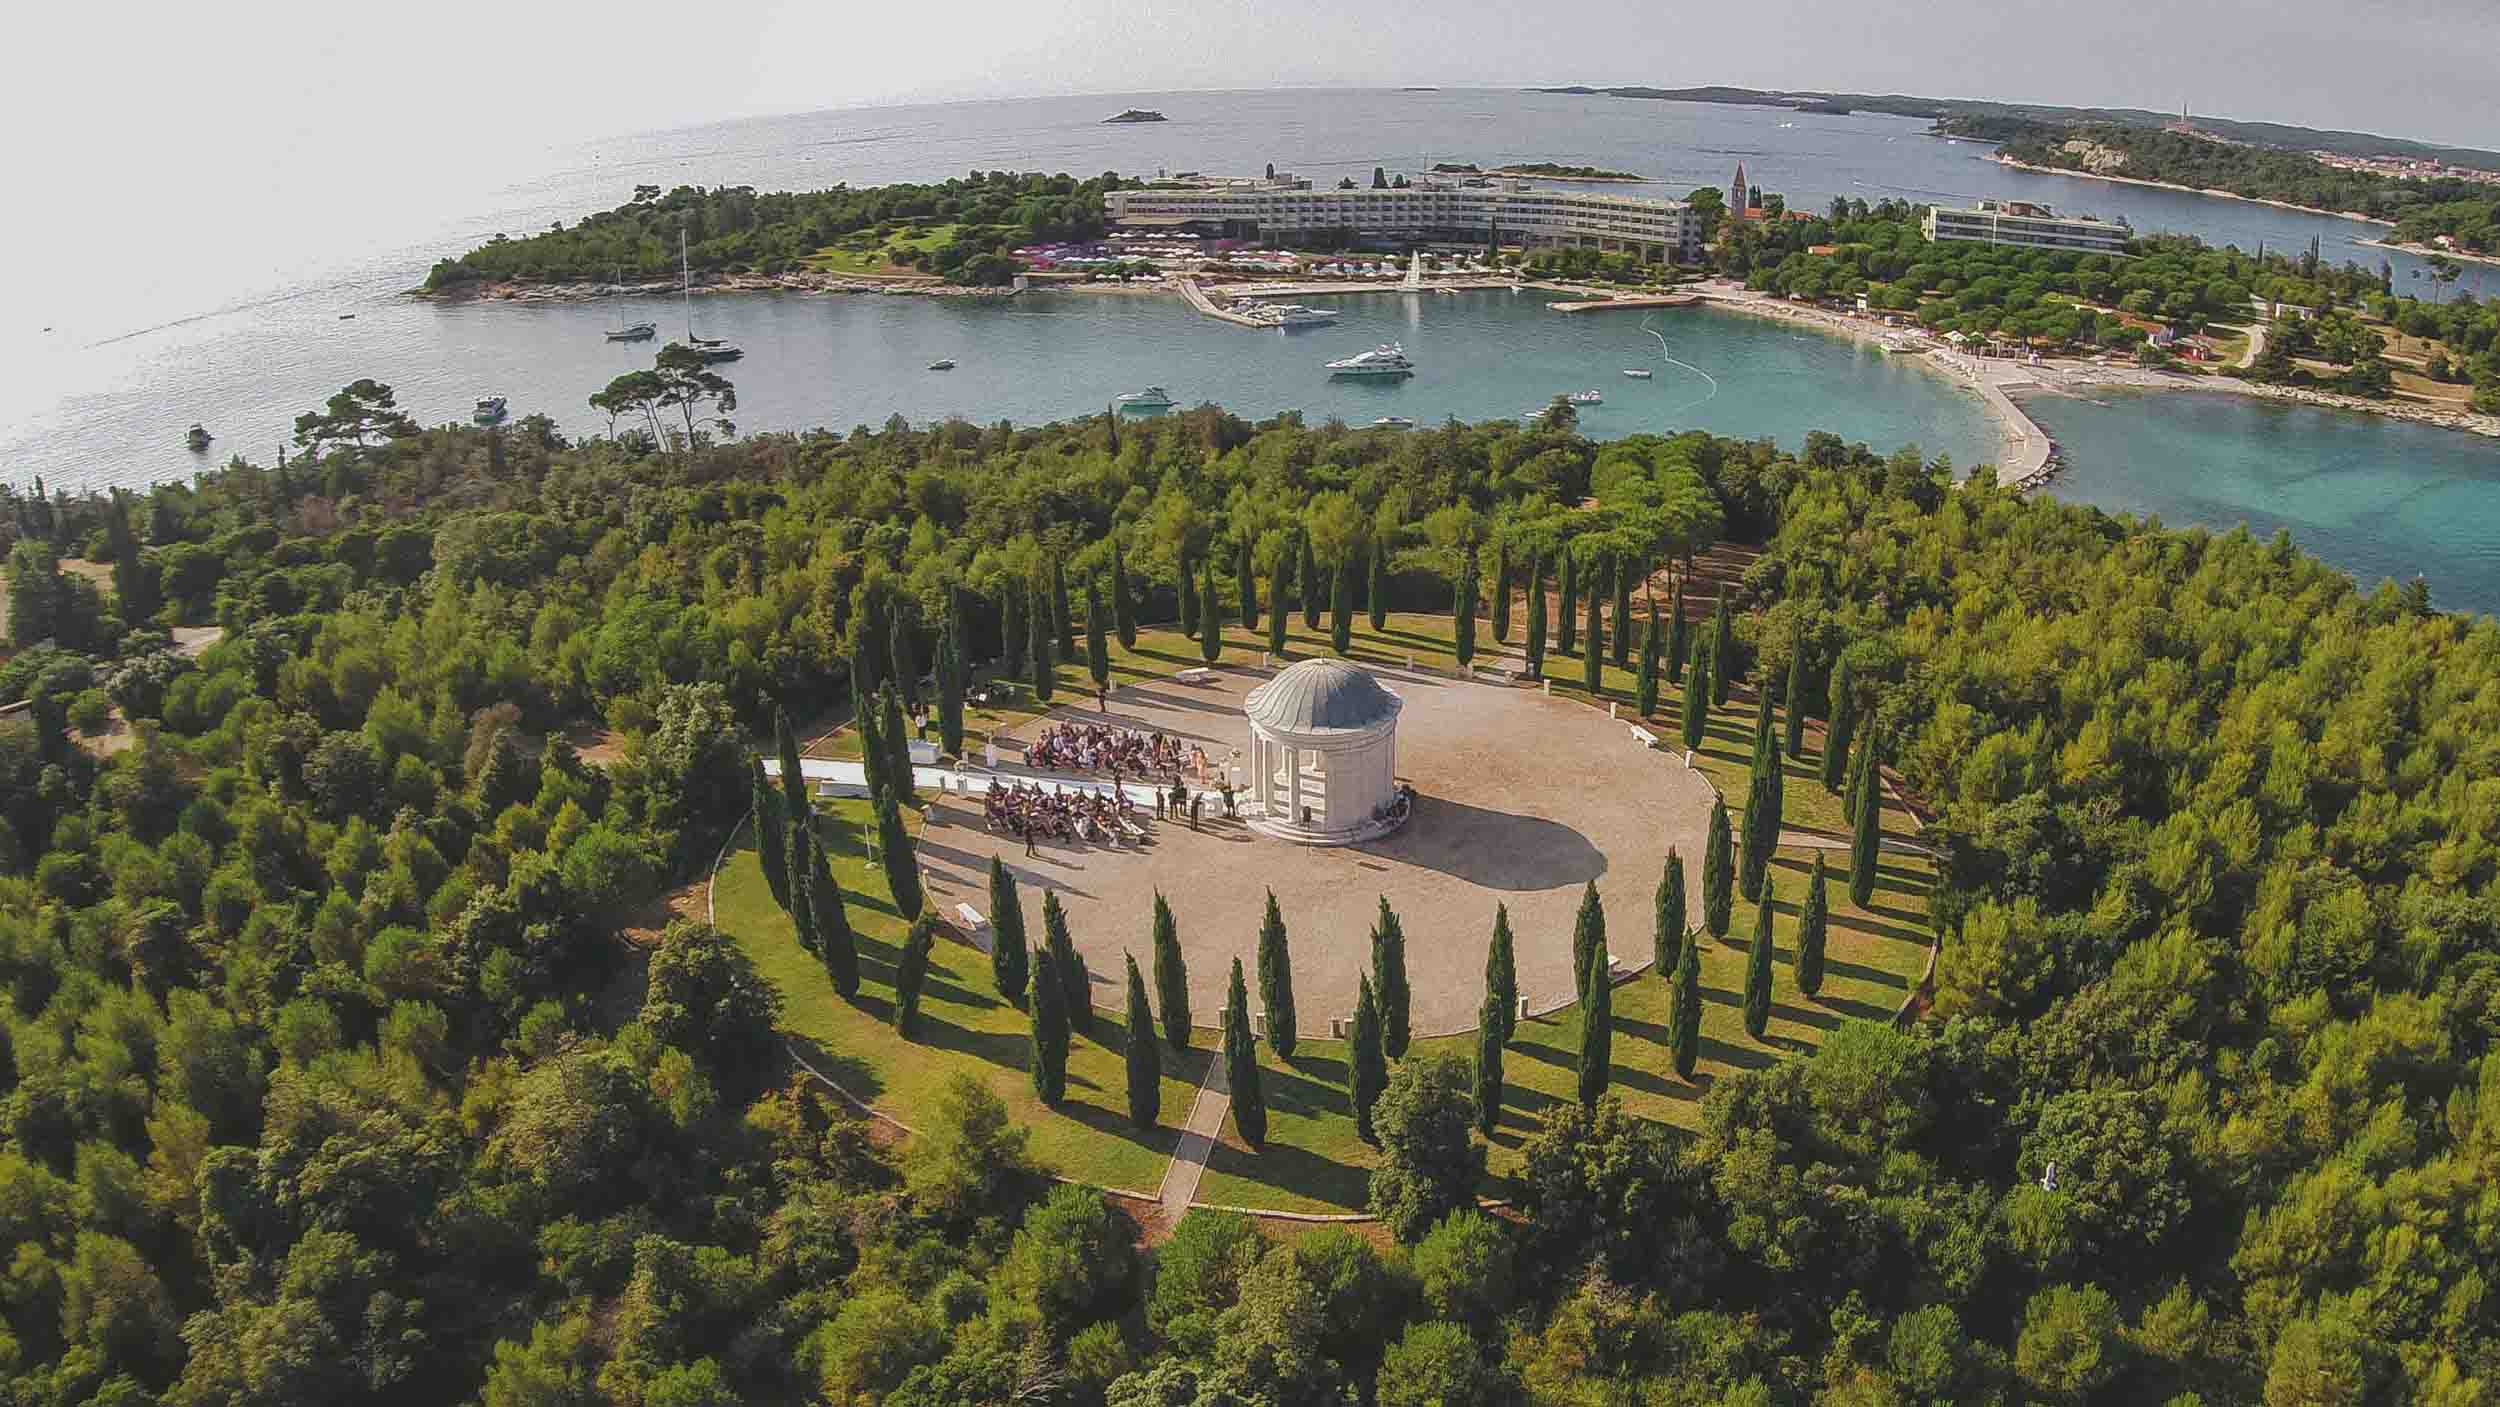 Heiraten Am Meer Kroatien Liebe